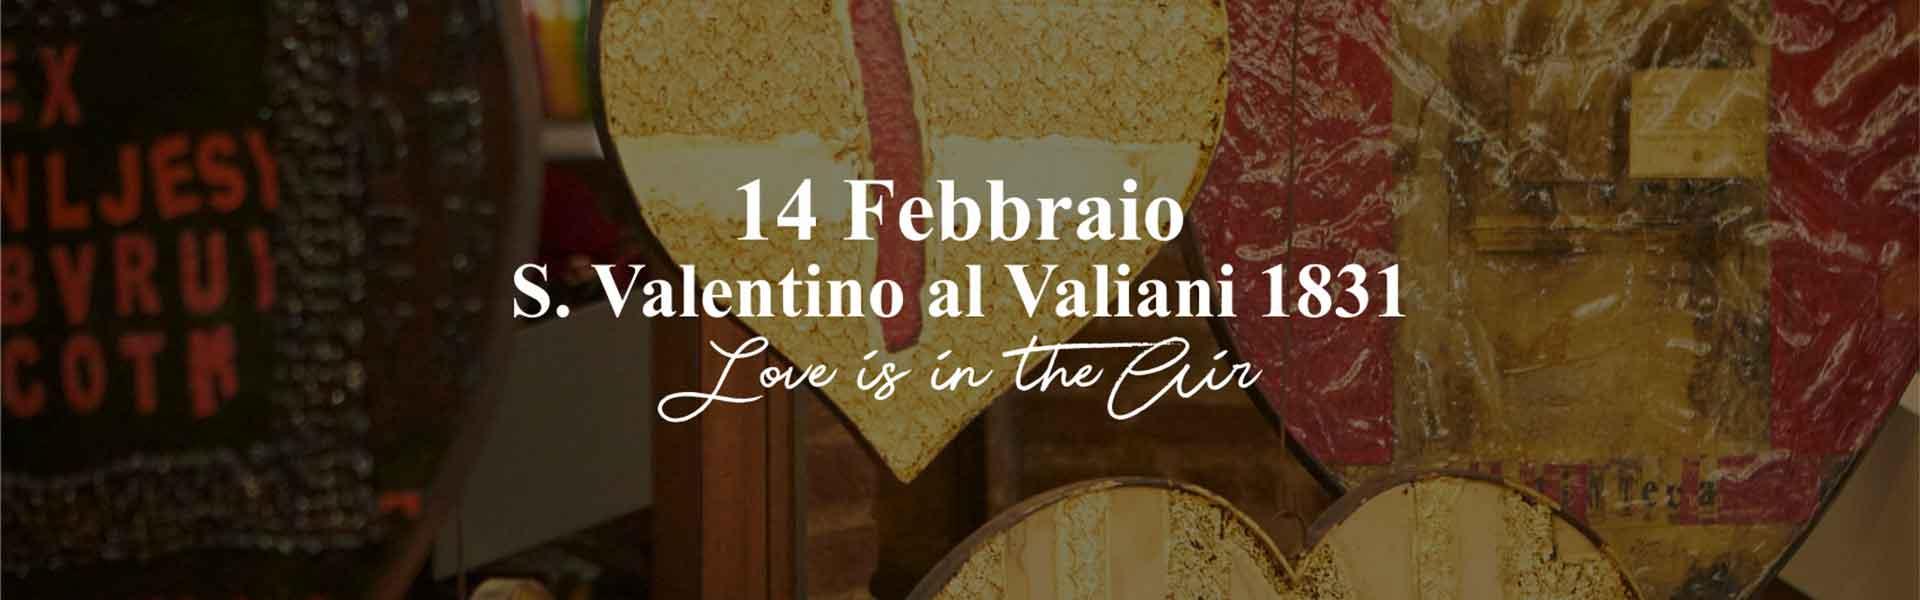 san-valentino-valiani-1831